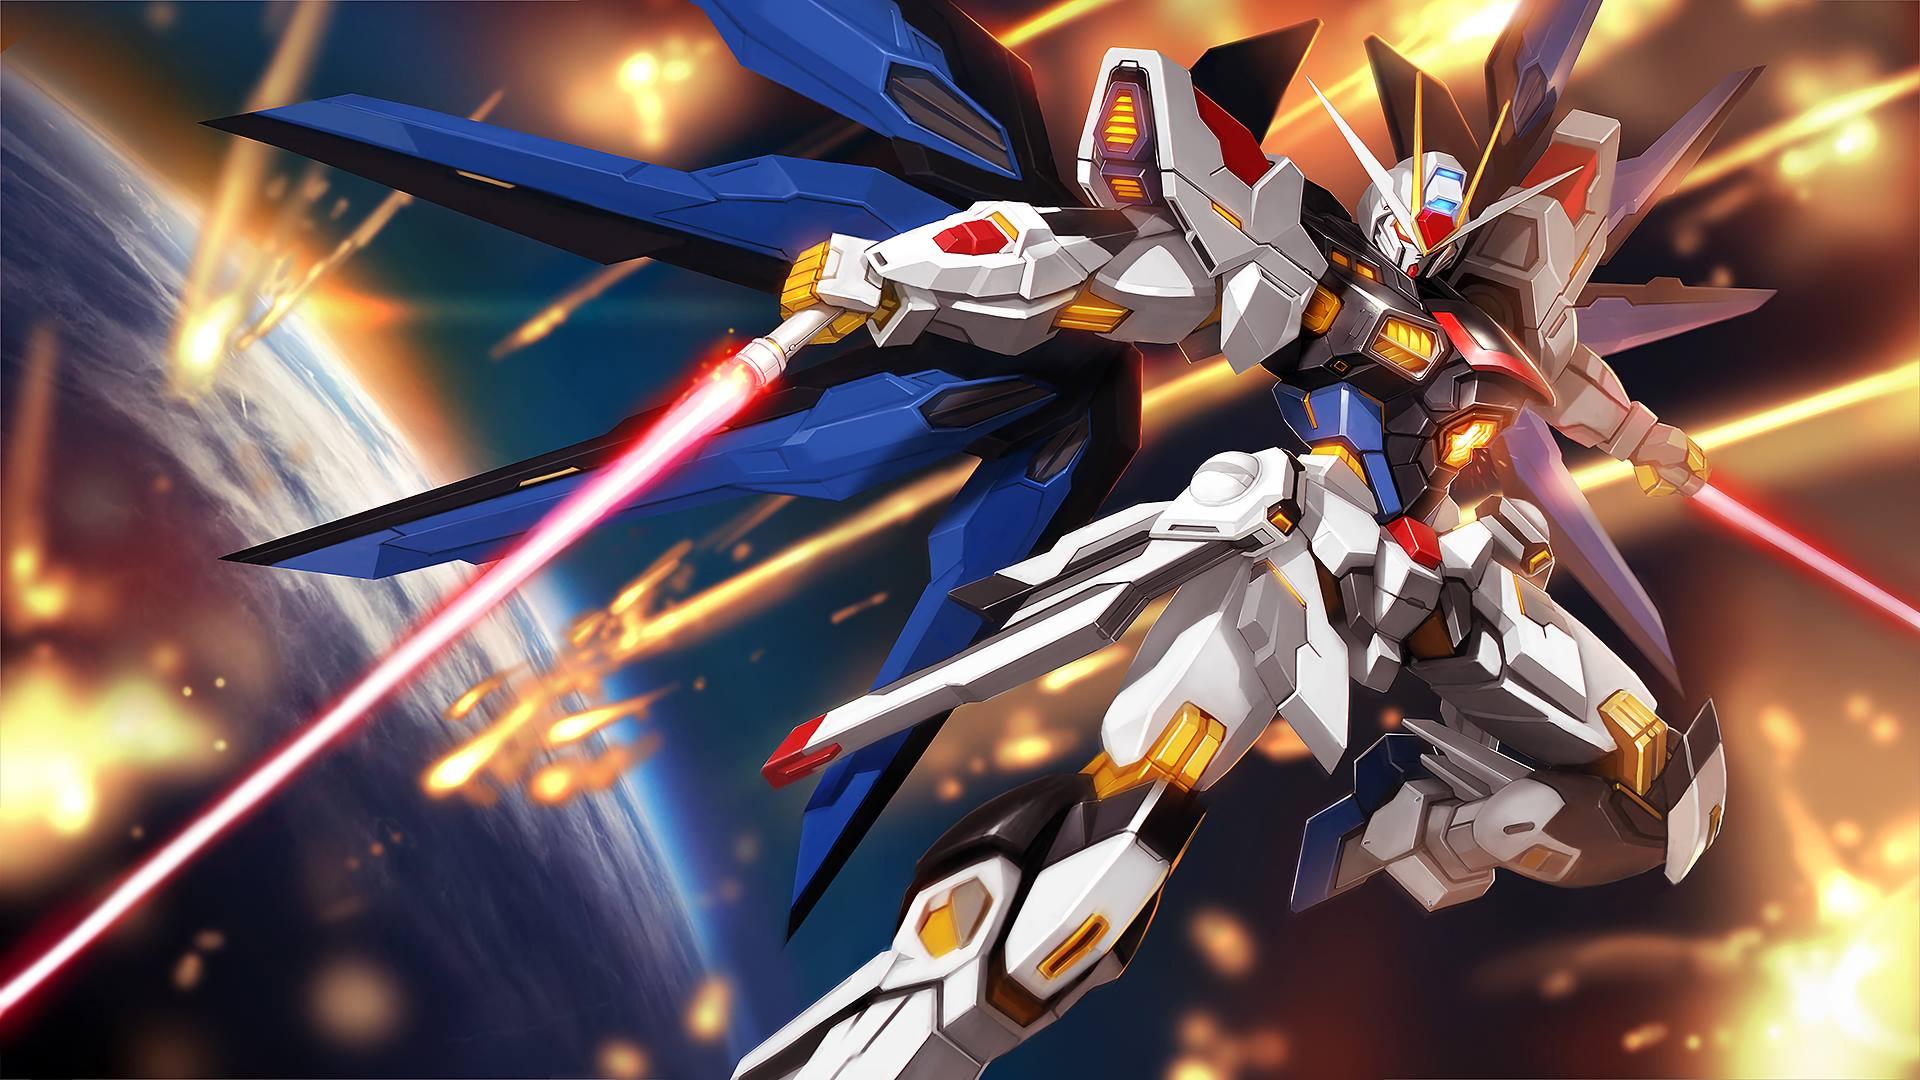 Hd Gundam Themes: Gundam HD Wallpapers (64+ Images